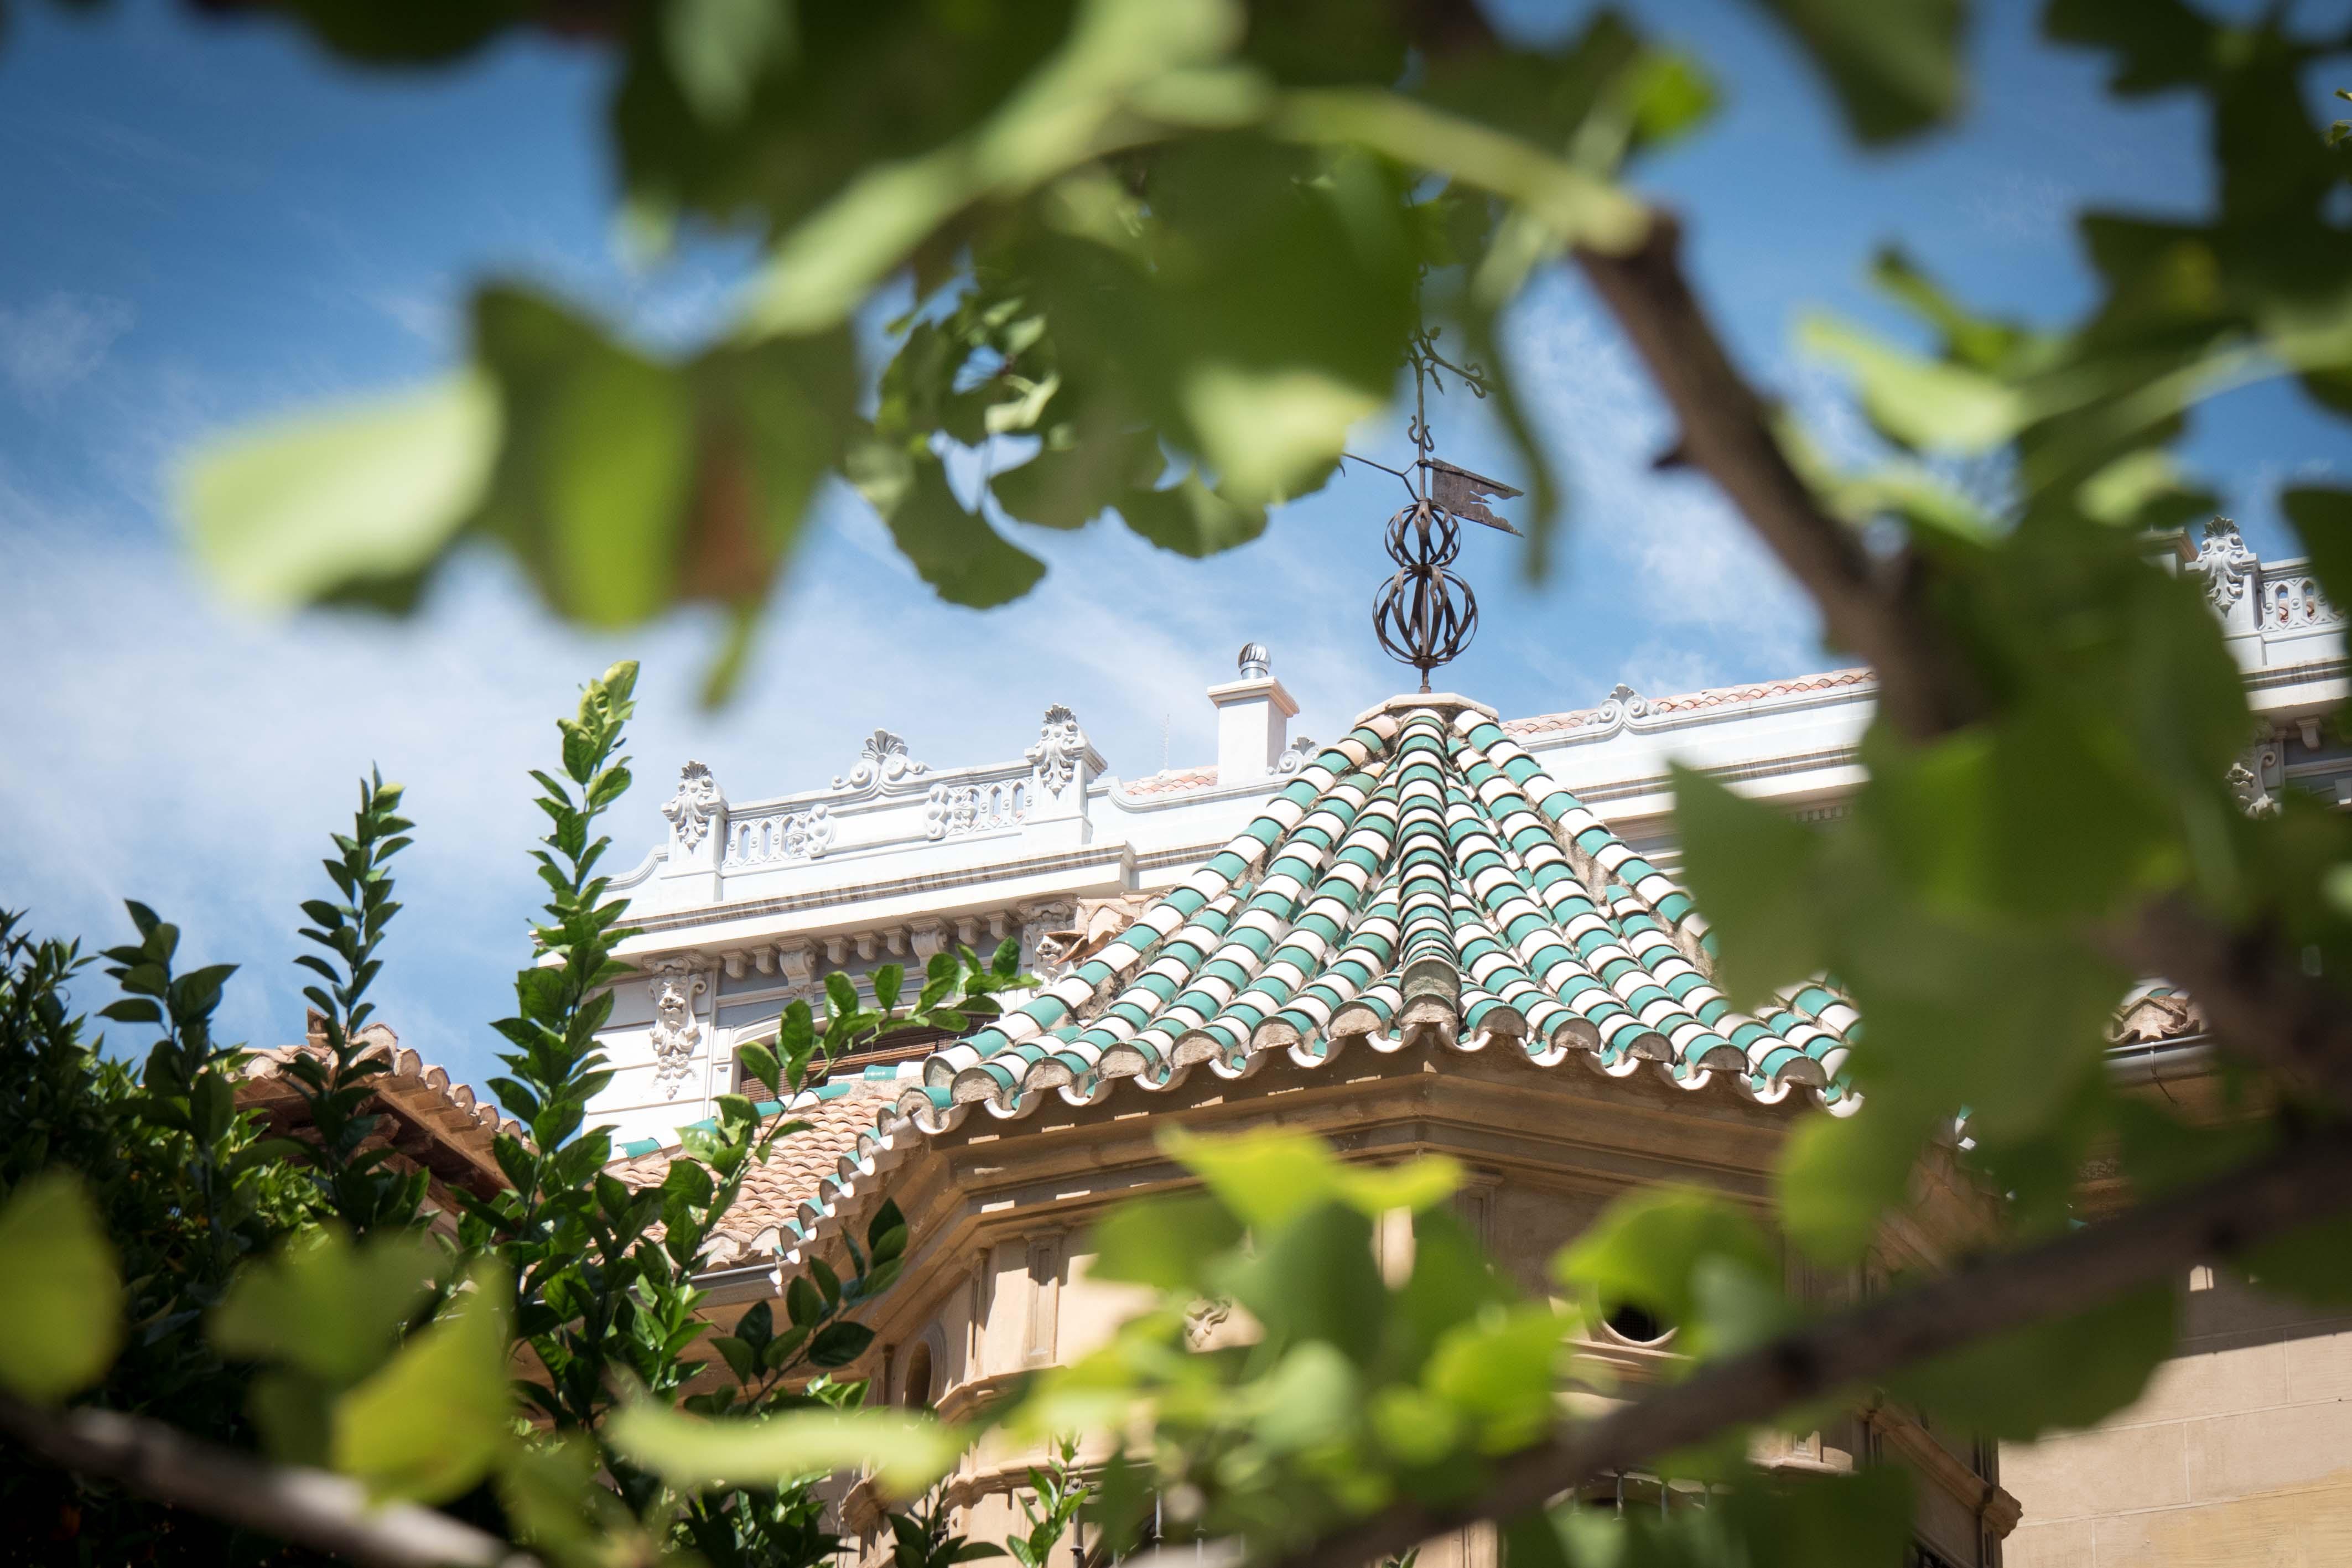 Roofs in Granada